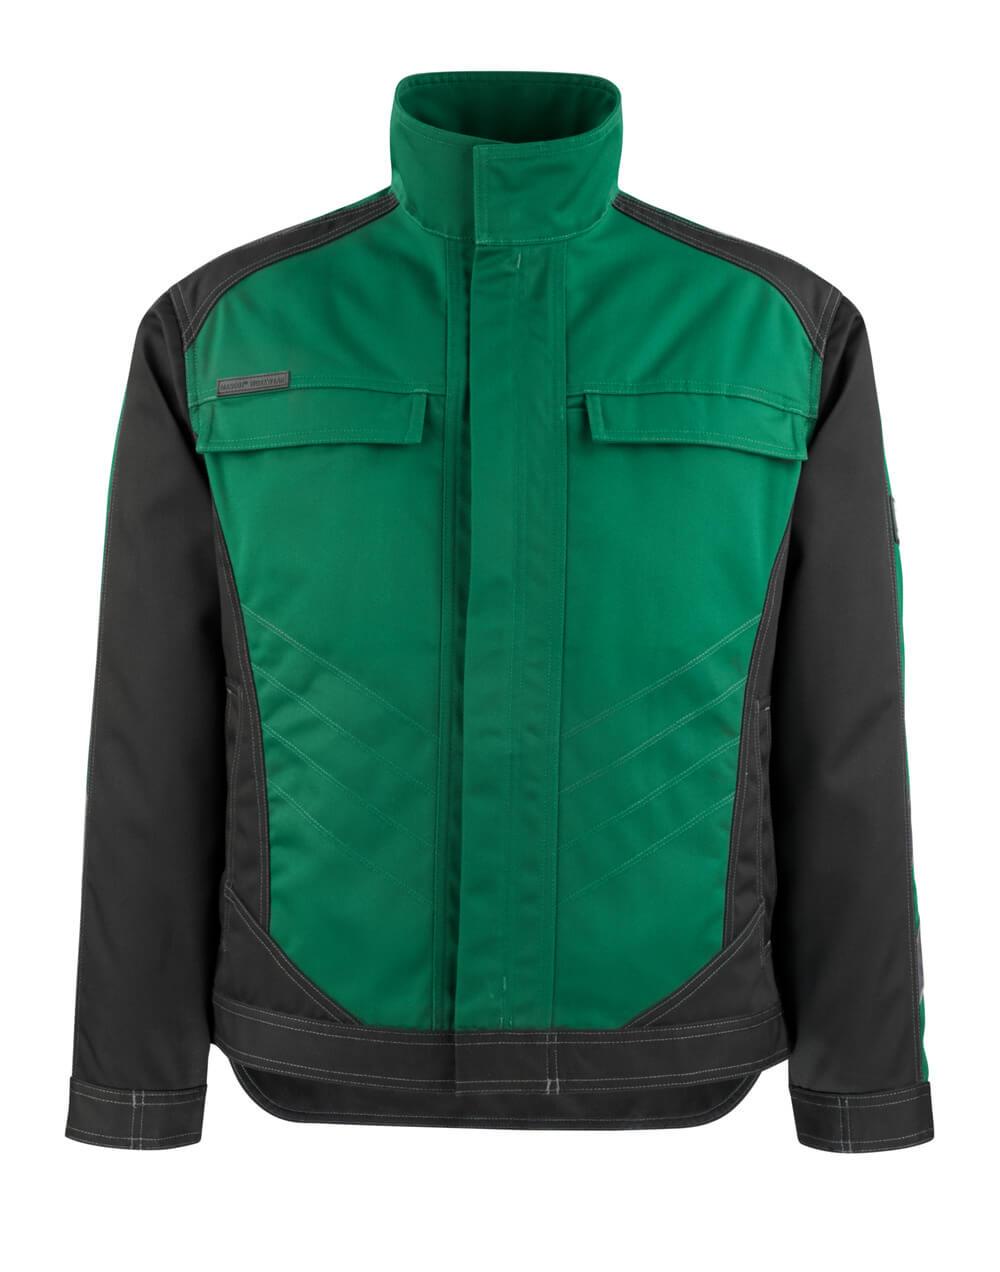 12009-203-0309 Jacket - green/black